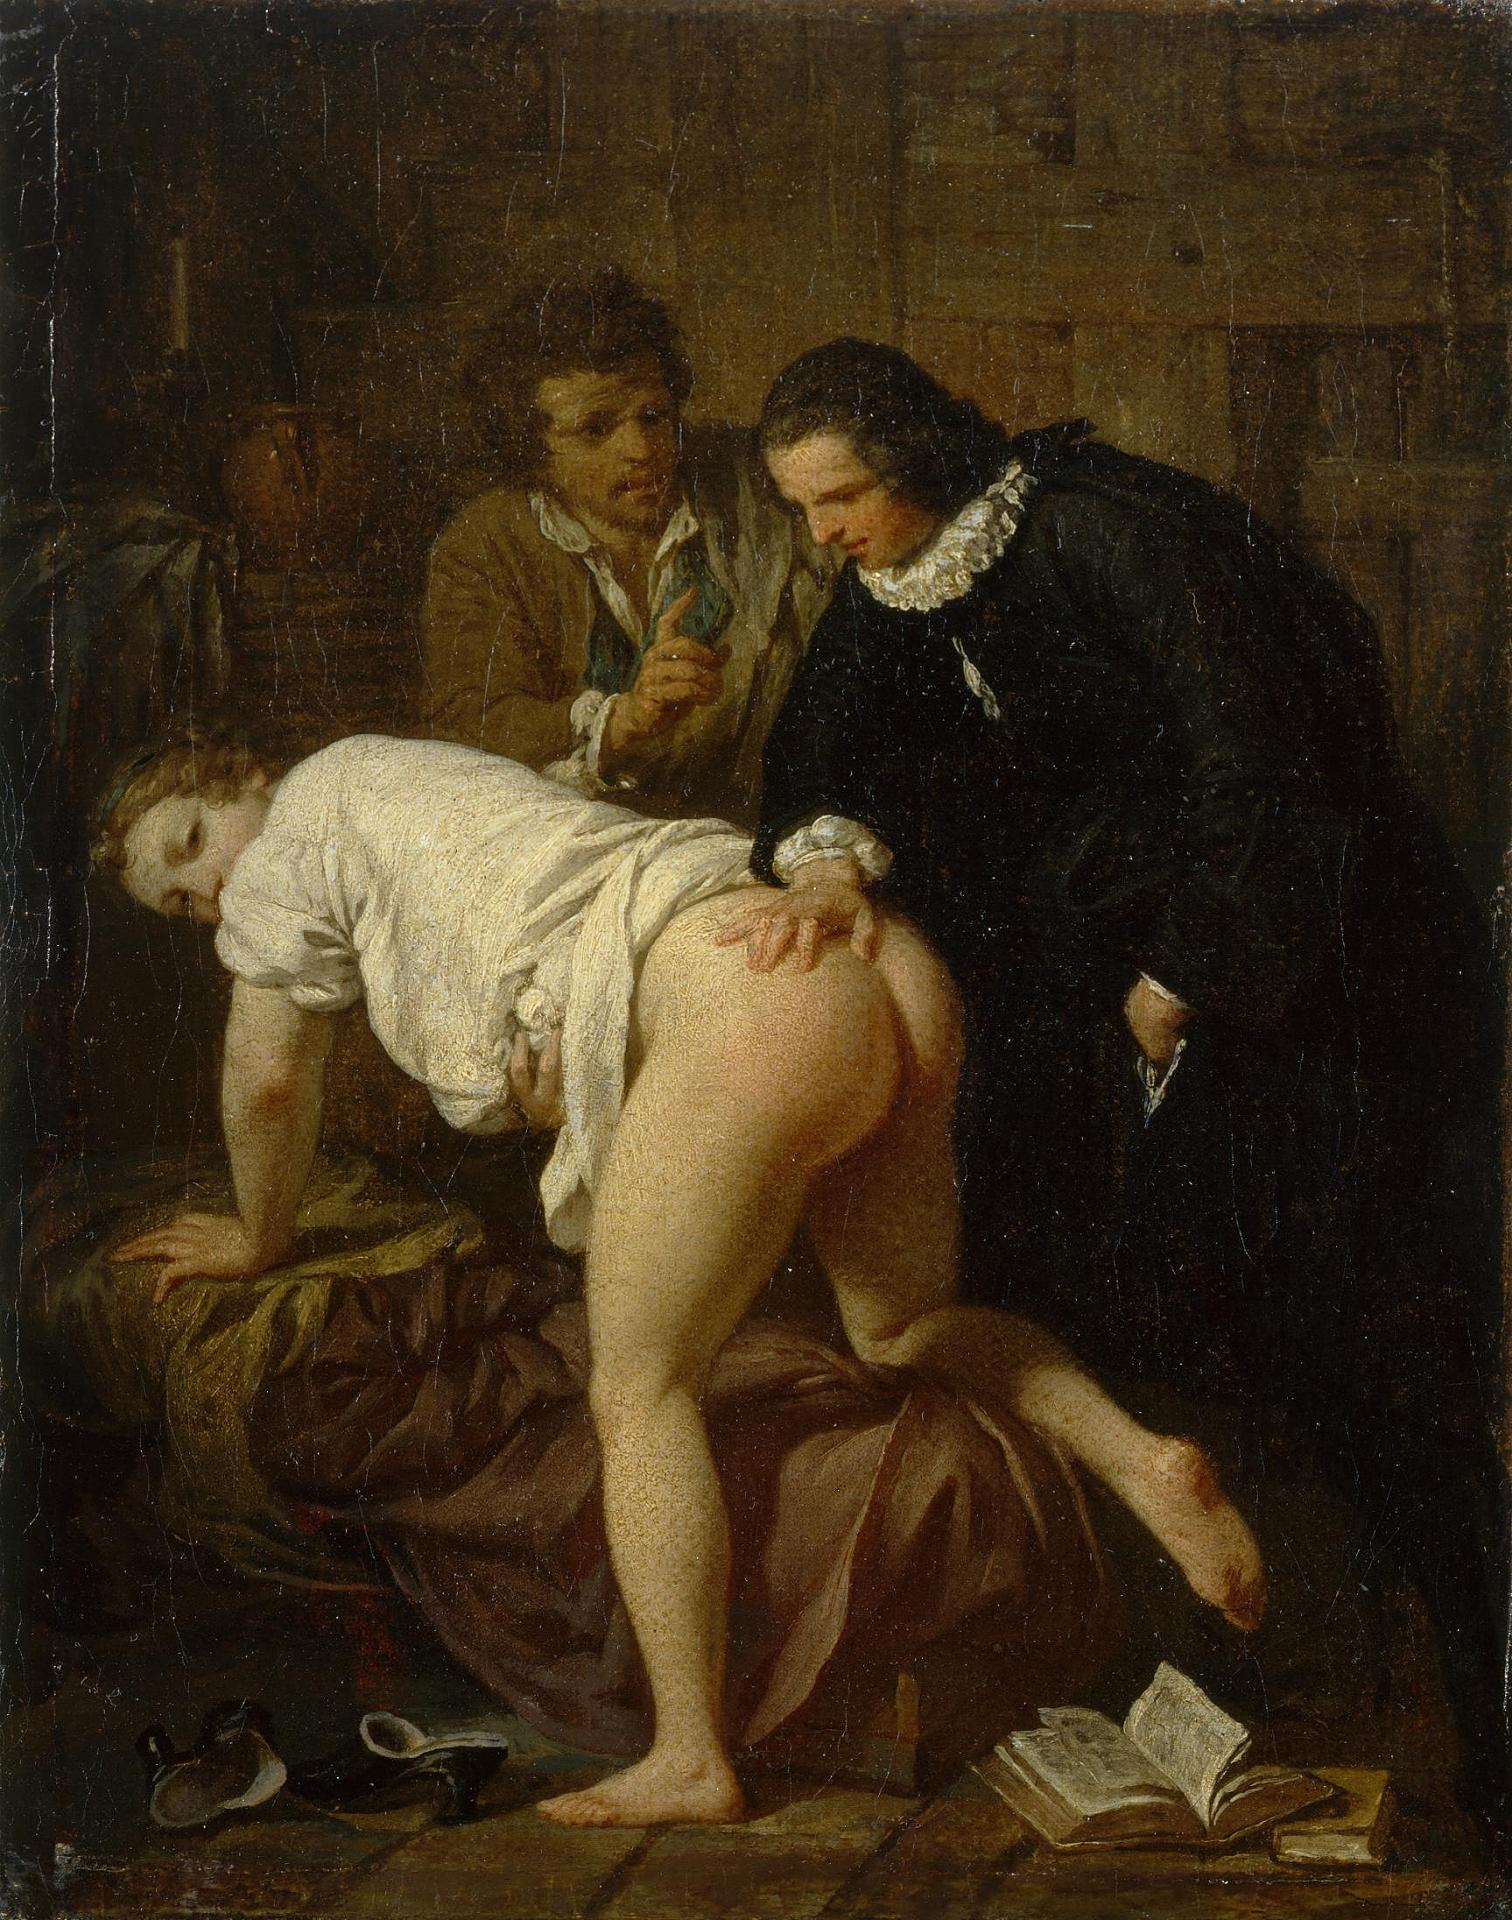 Subleyras 1735 La Jument de Pierre Ermitage Saint Petersbourg